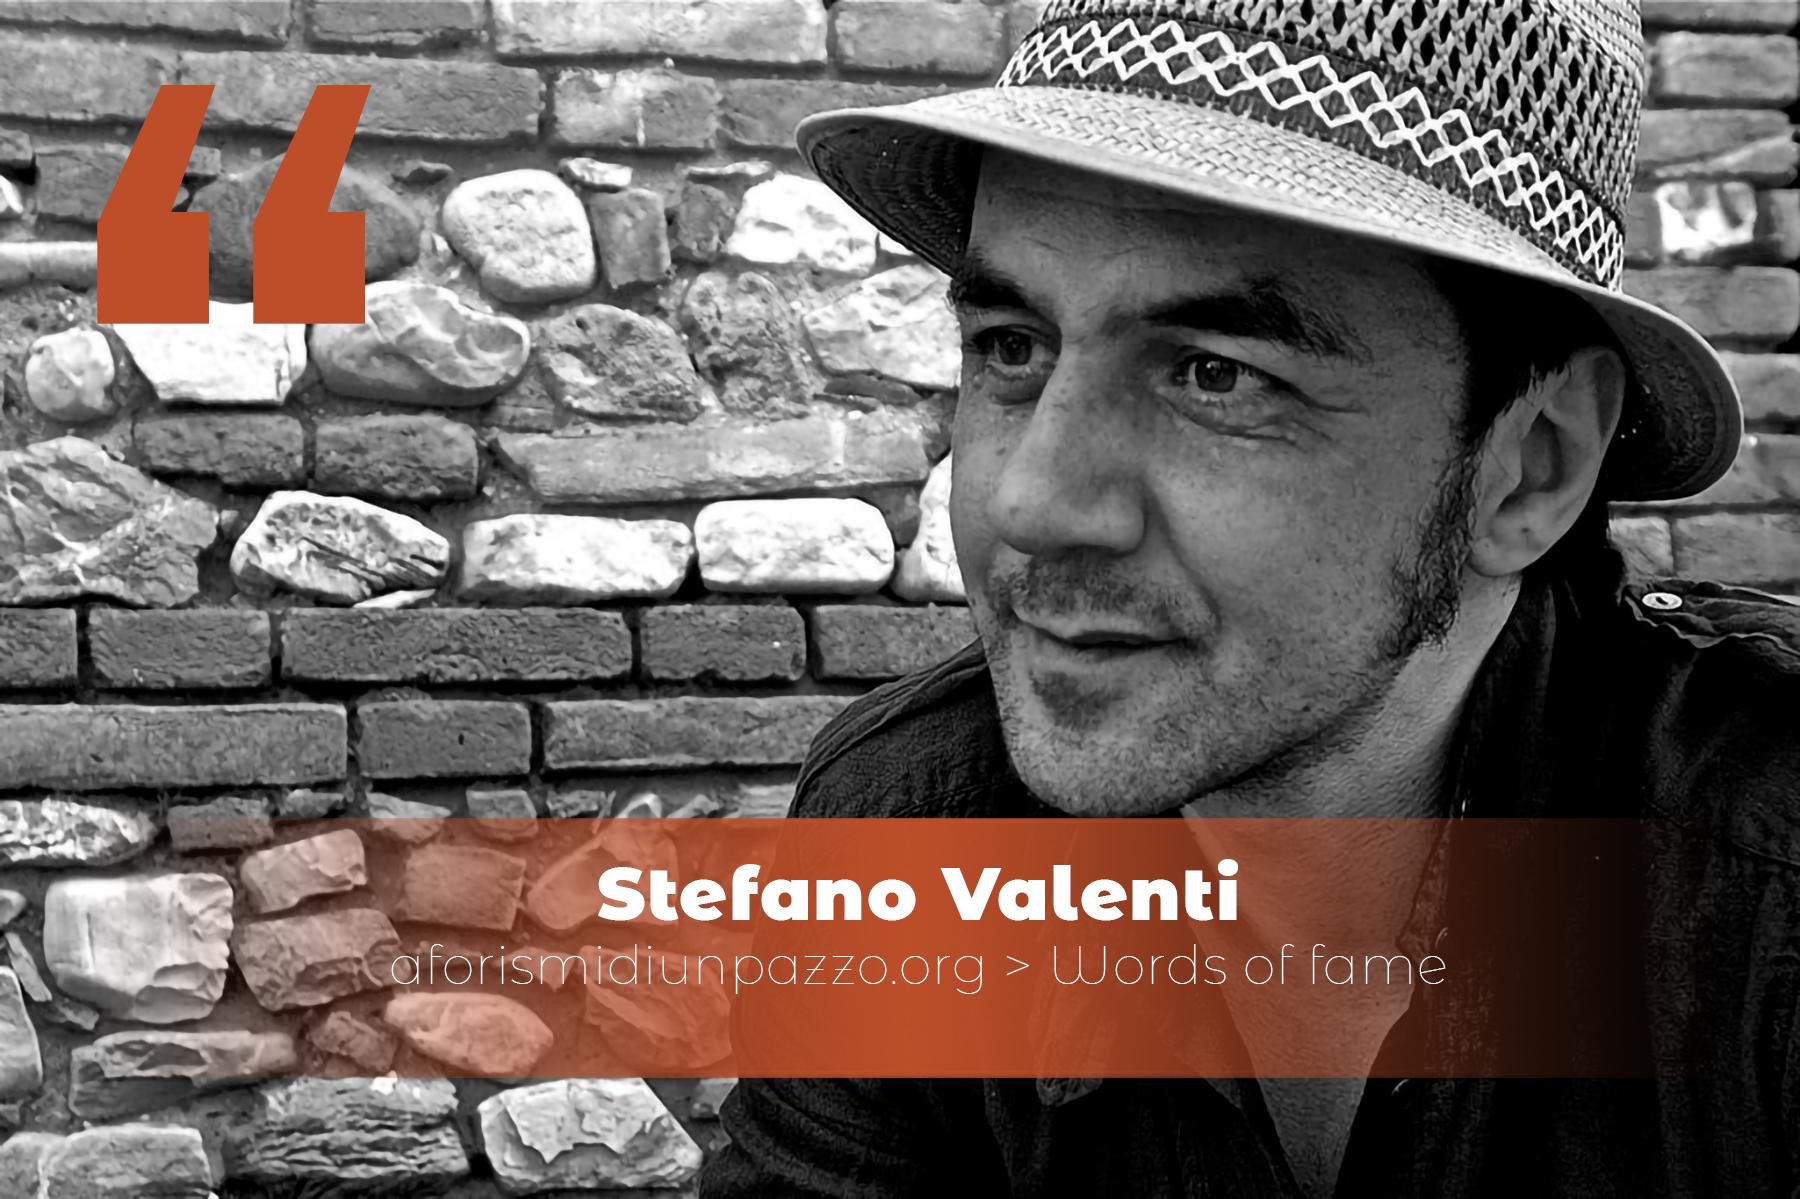 Citazioni di Stefano Valenti